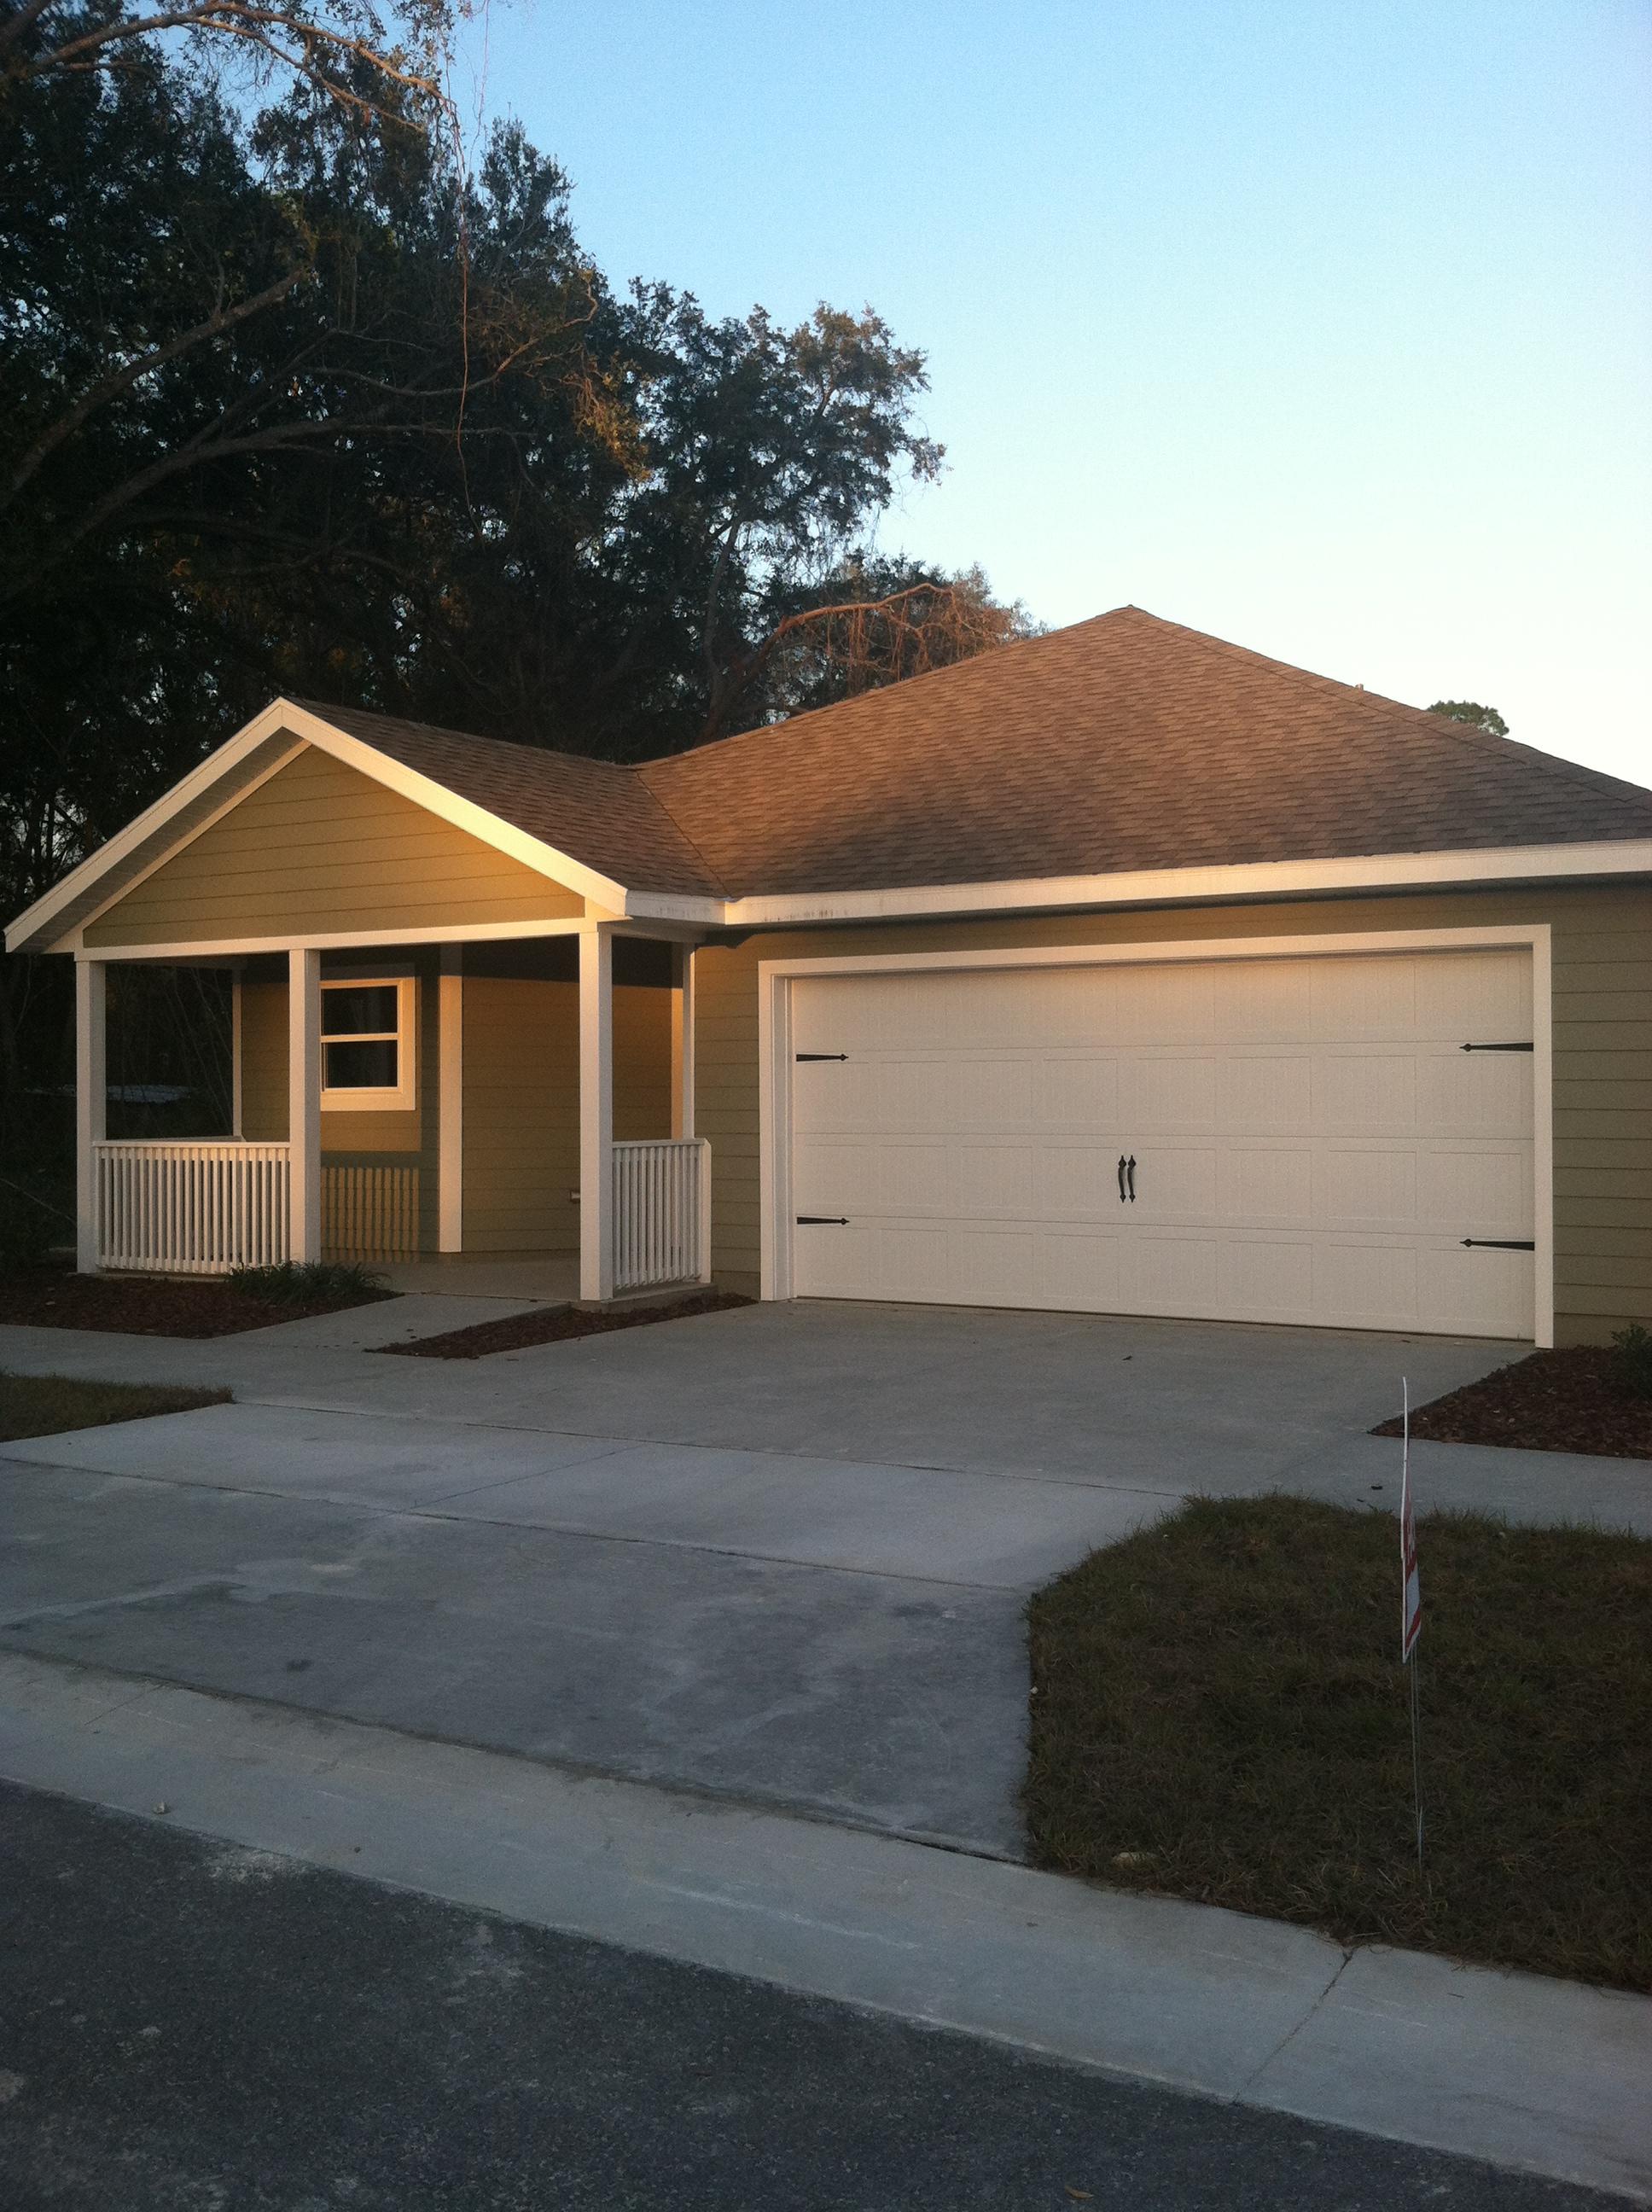 Chris martin properties newberrys newest community offering homes starting in 160s rubansaba